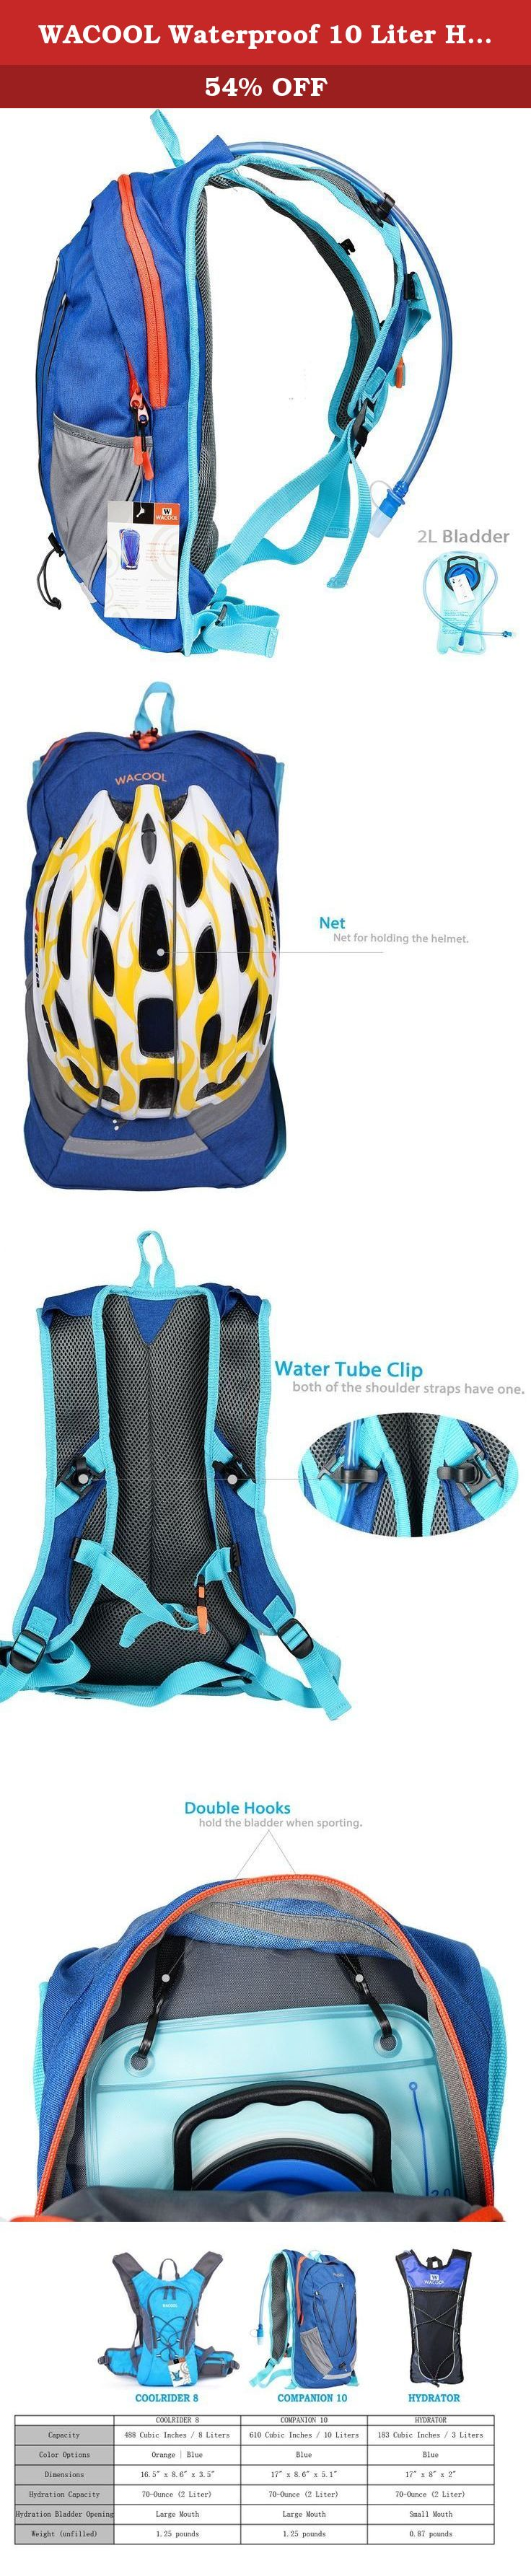 WACOOL Waterproof 10 Liter Hydration Bladder Pack, Cycling